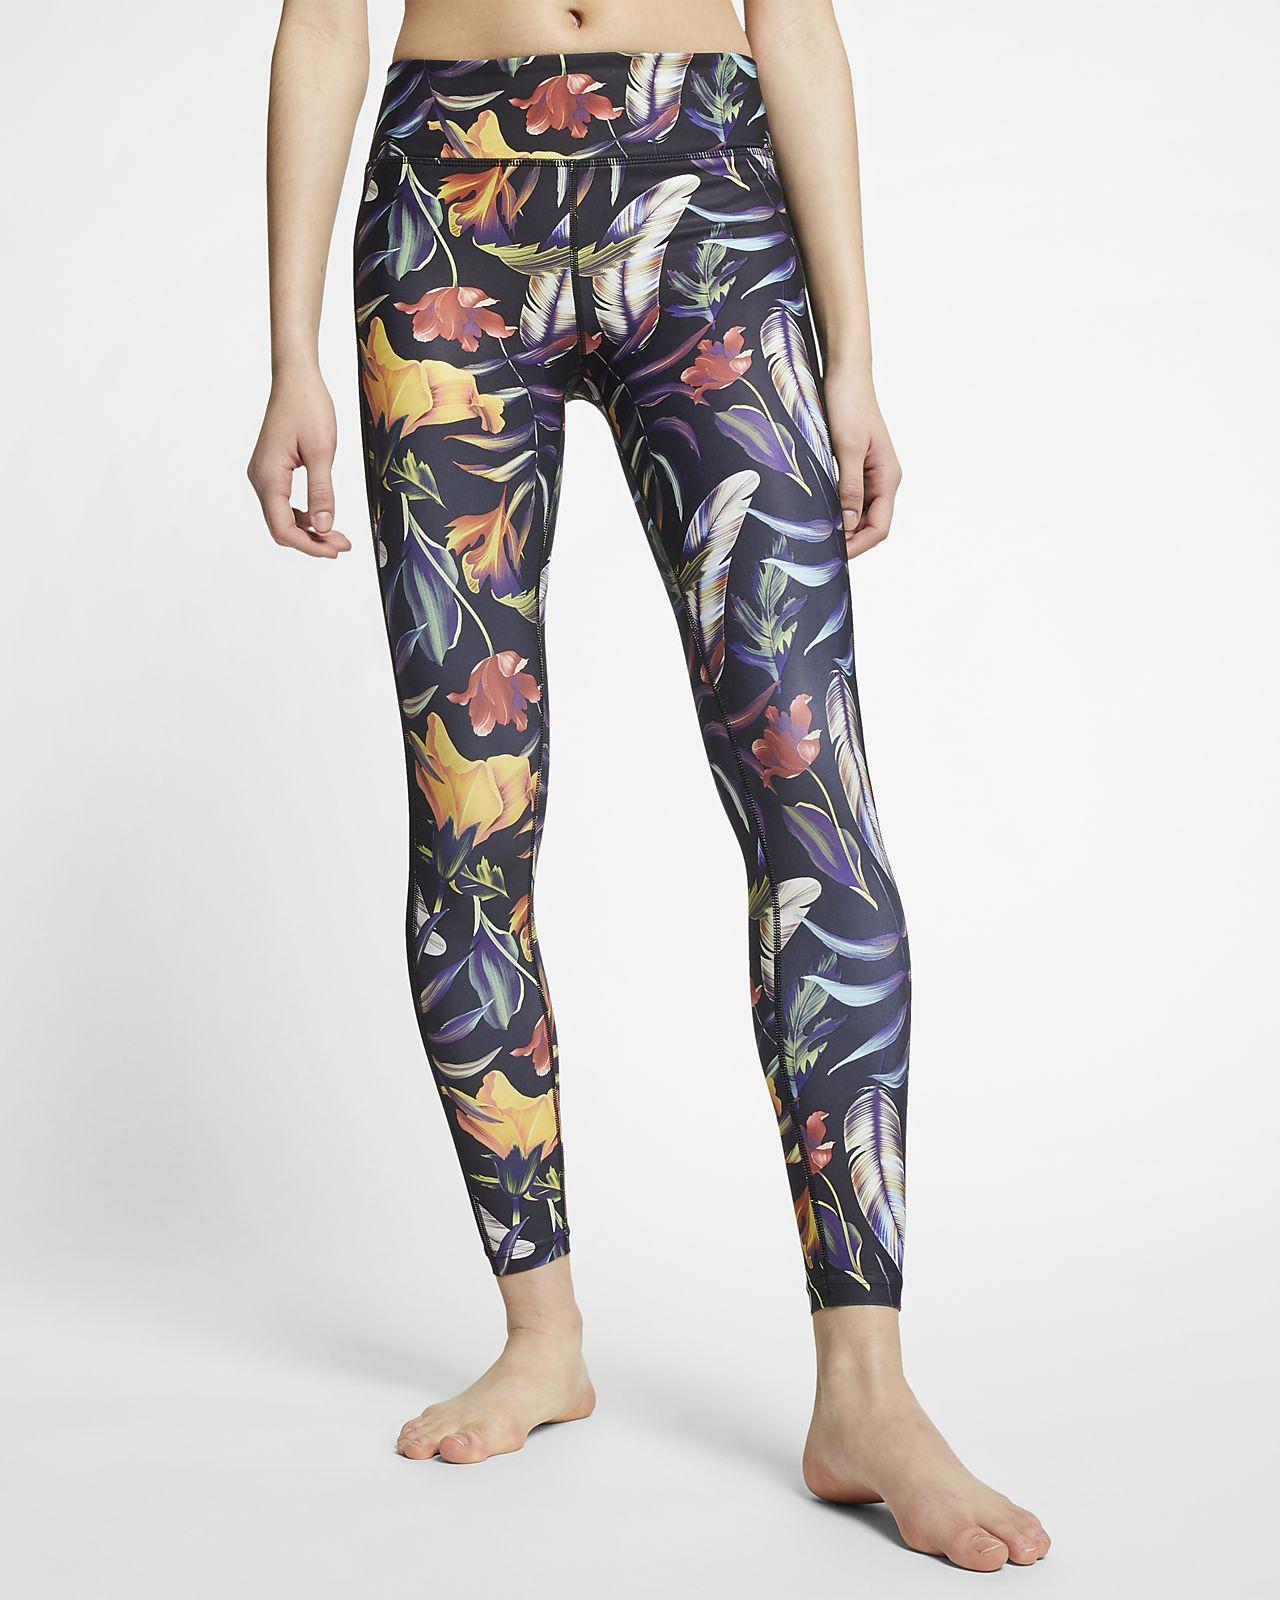 19b4fef741b1 Hurley Quick Dry Women s Floral Surf Leggings. Nike.com